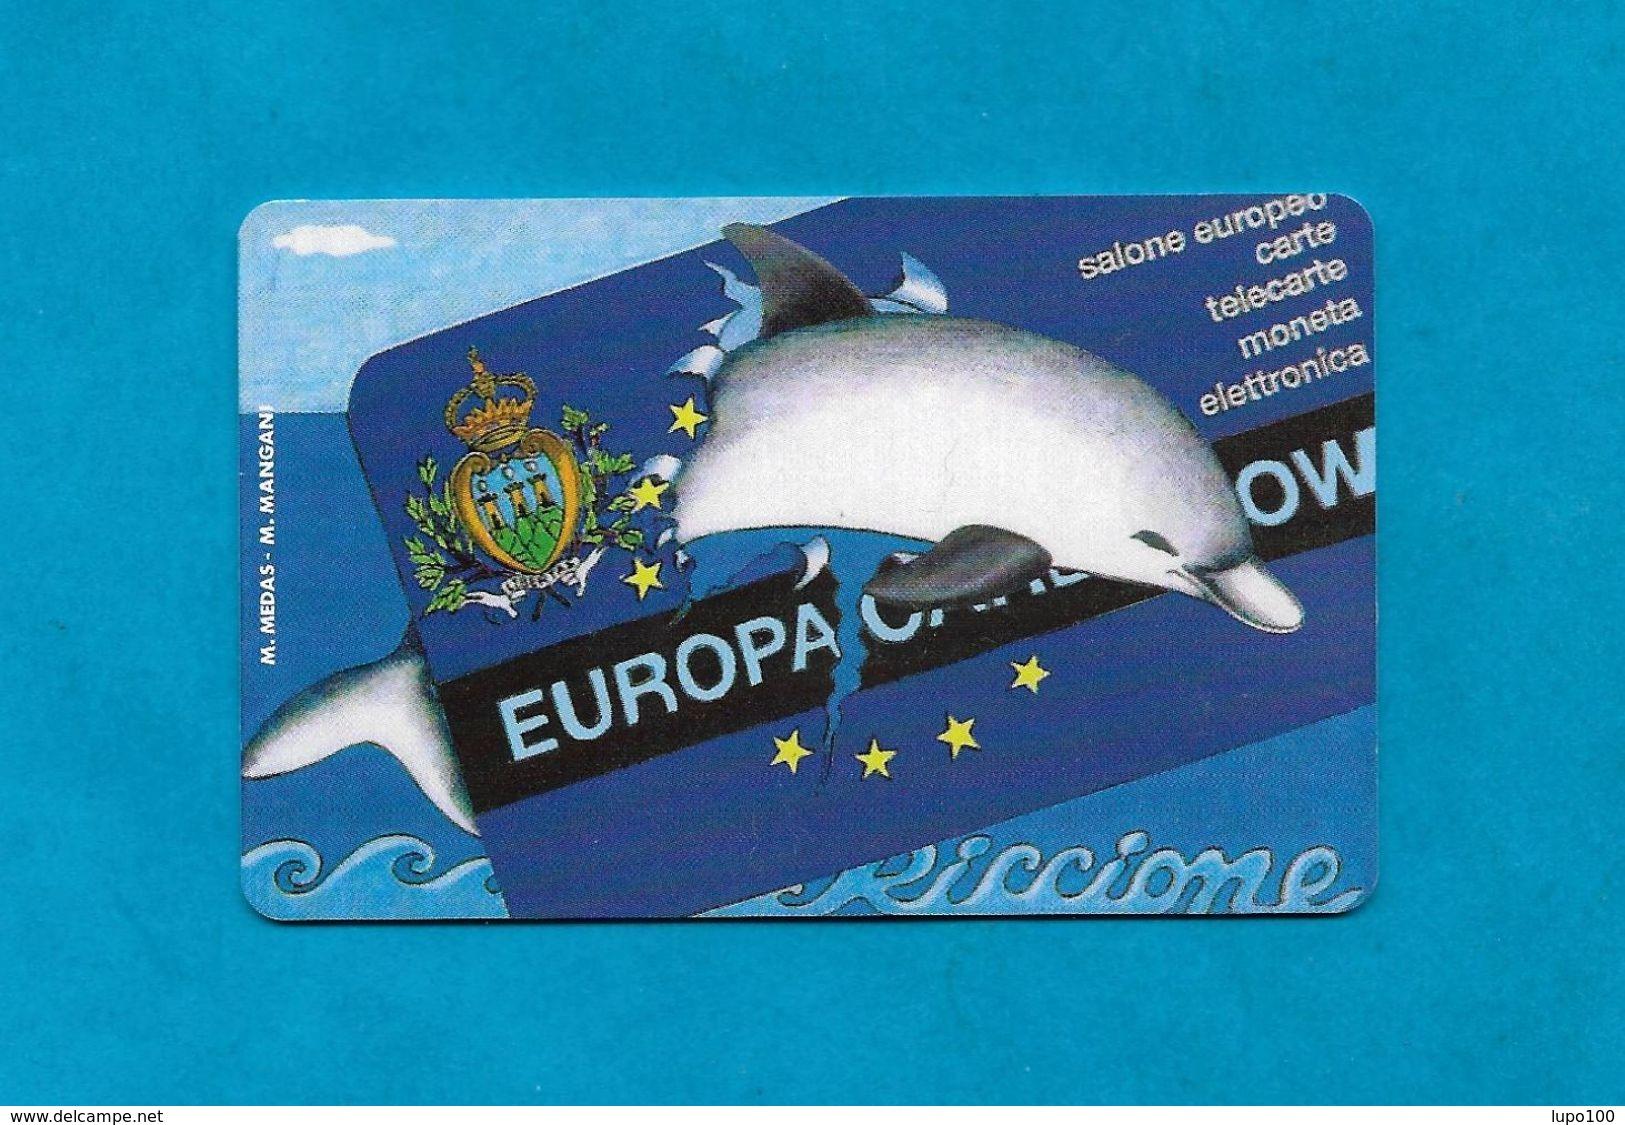 SAN MARINO SCHEDA TELEFONICA NUOVA NEW PHONECARD 30 - EUROPA CARD SHOW DELFINO - San Marino